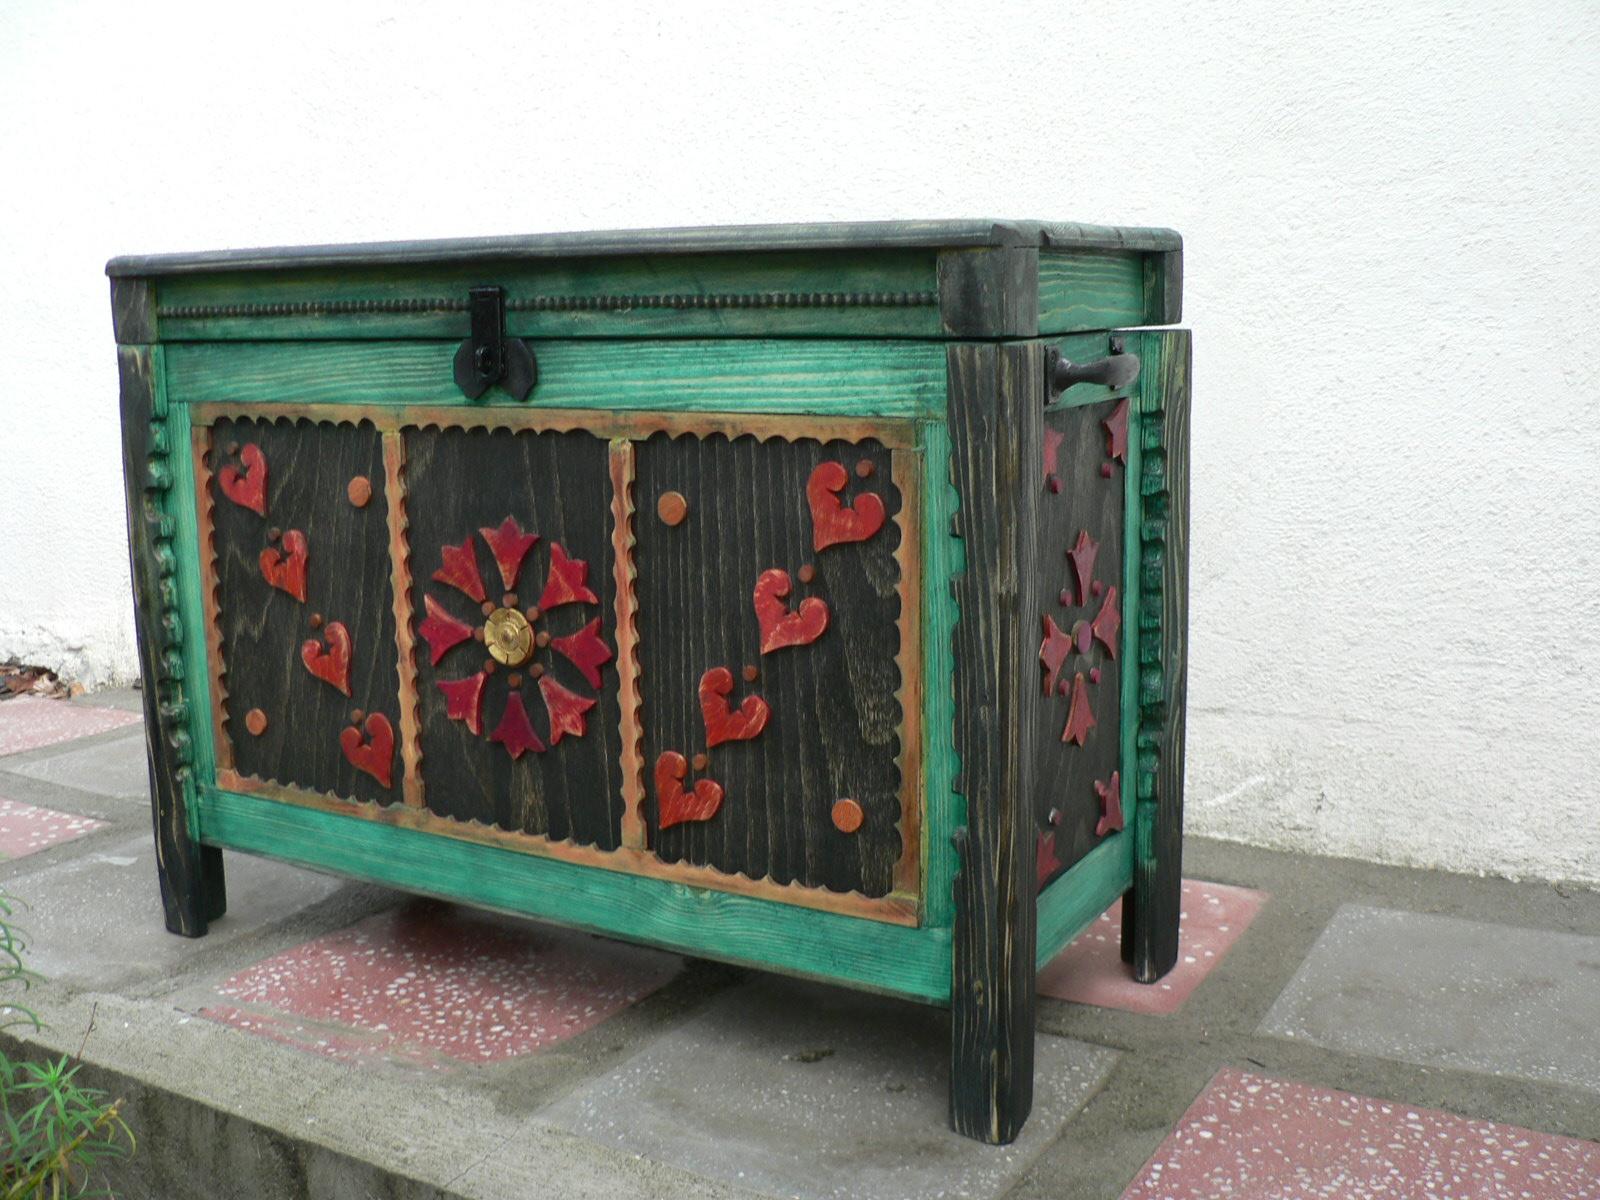 CUFAR-lemn de brad cu motive populare.Dim. 90x40x70cm